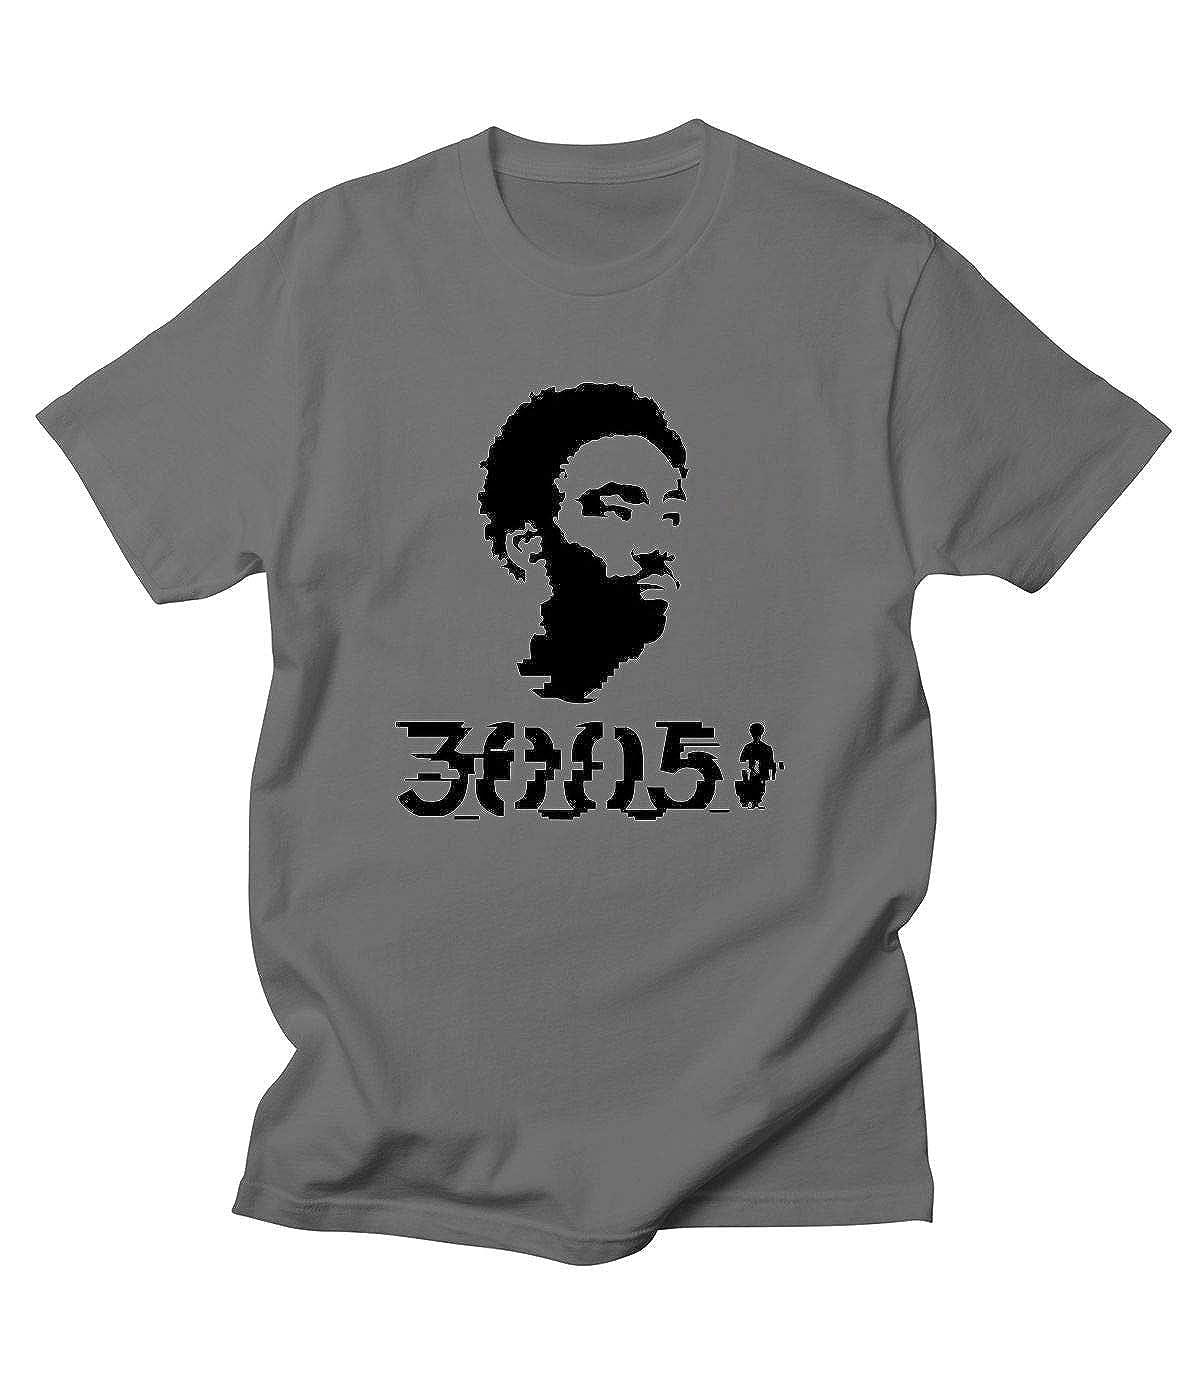 LuoYCHANG Childish Gambino T-Shirts for Men